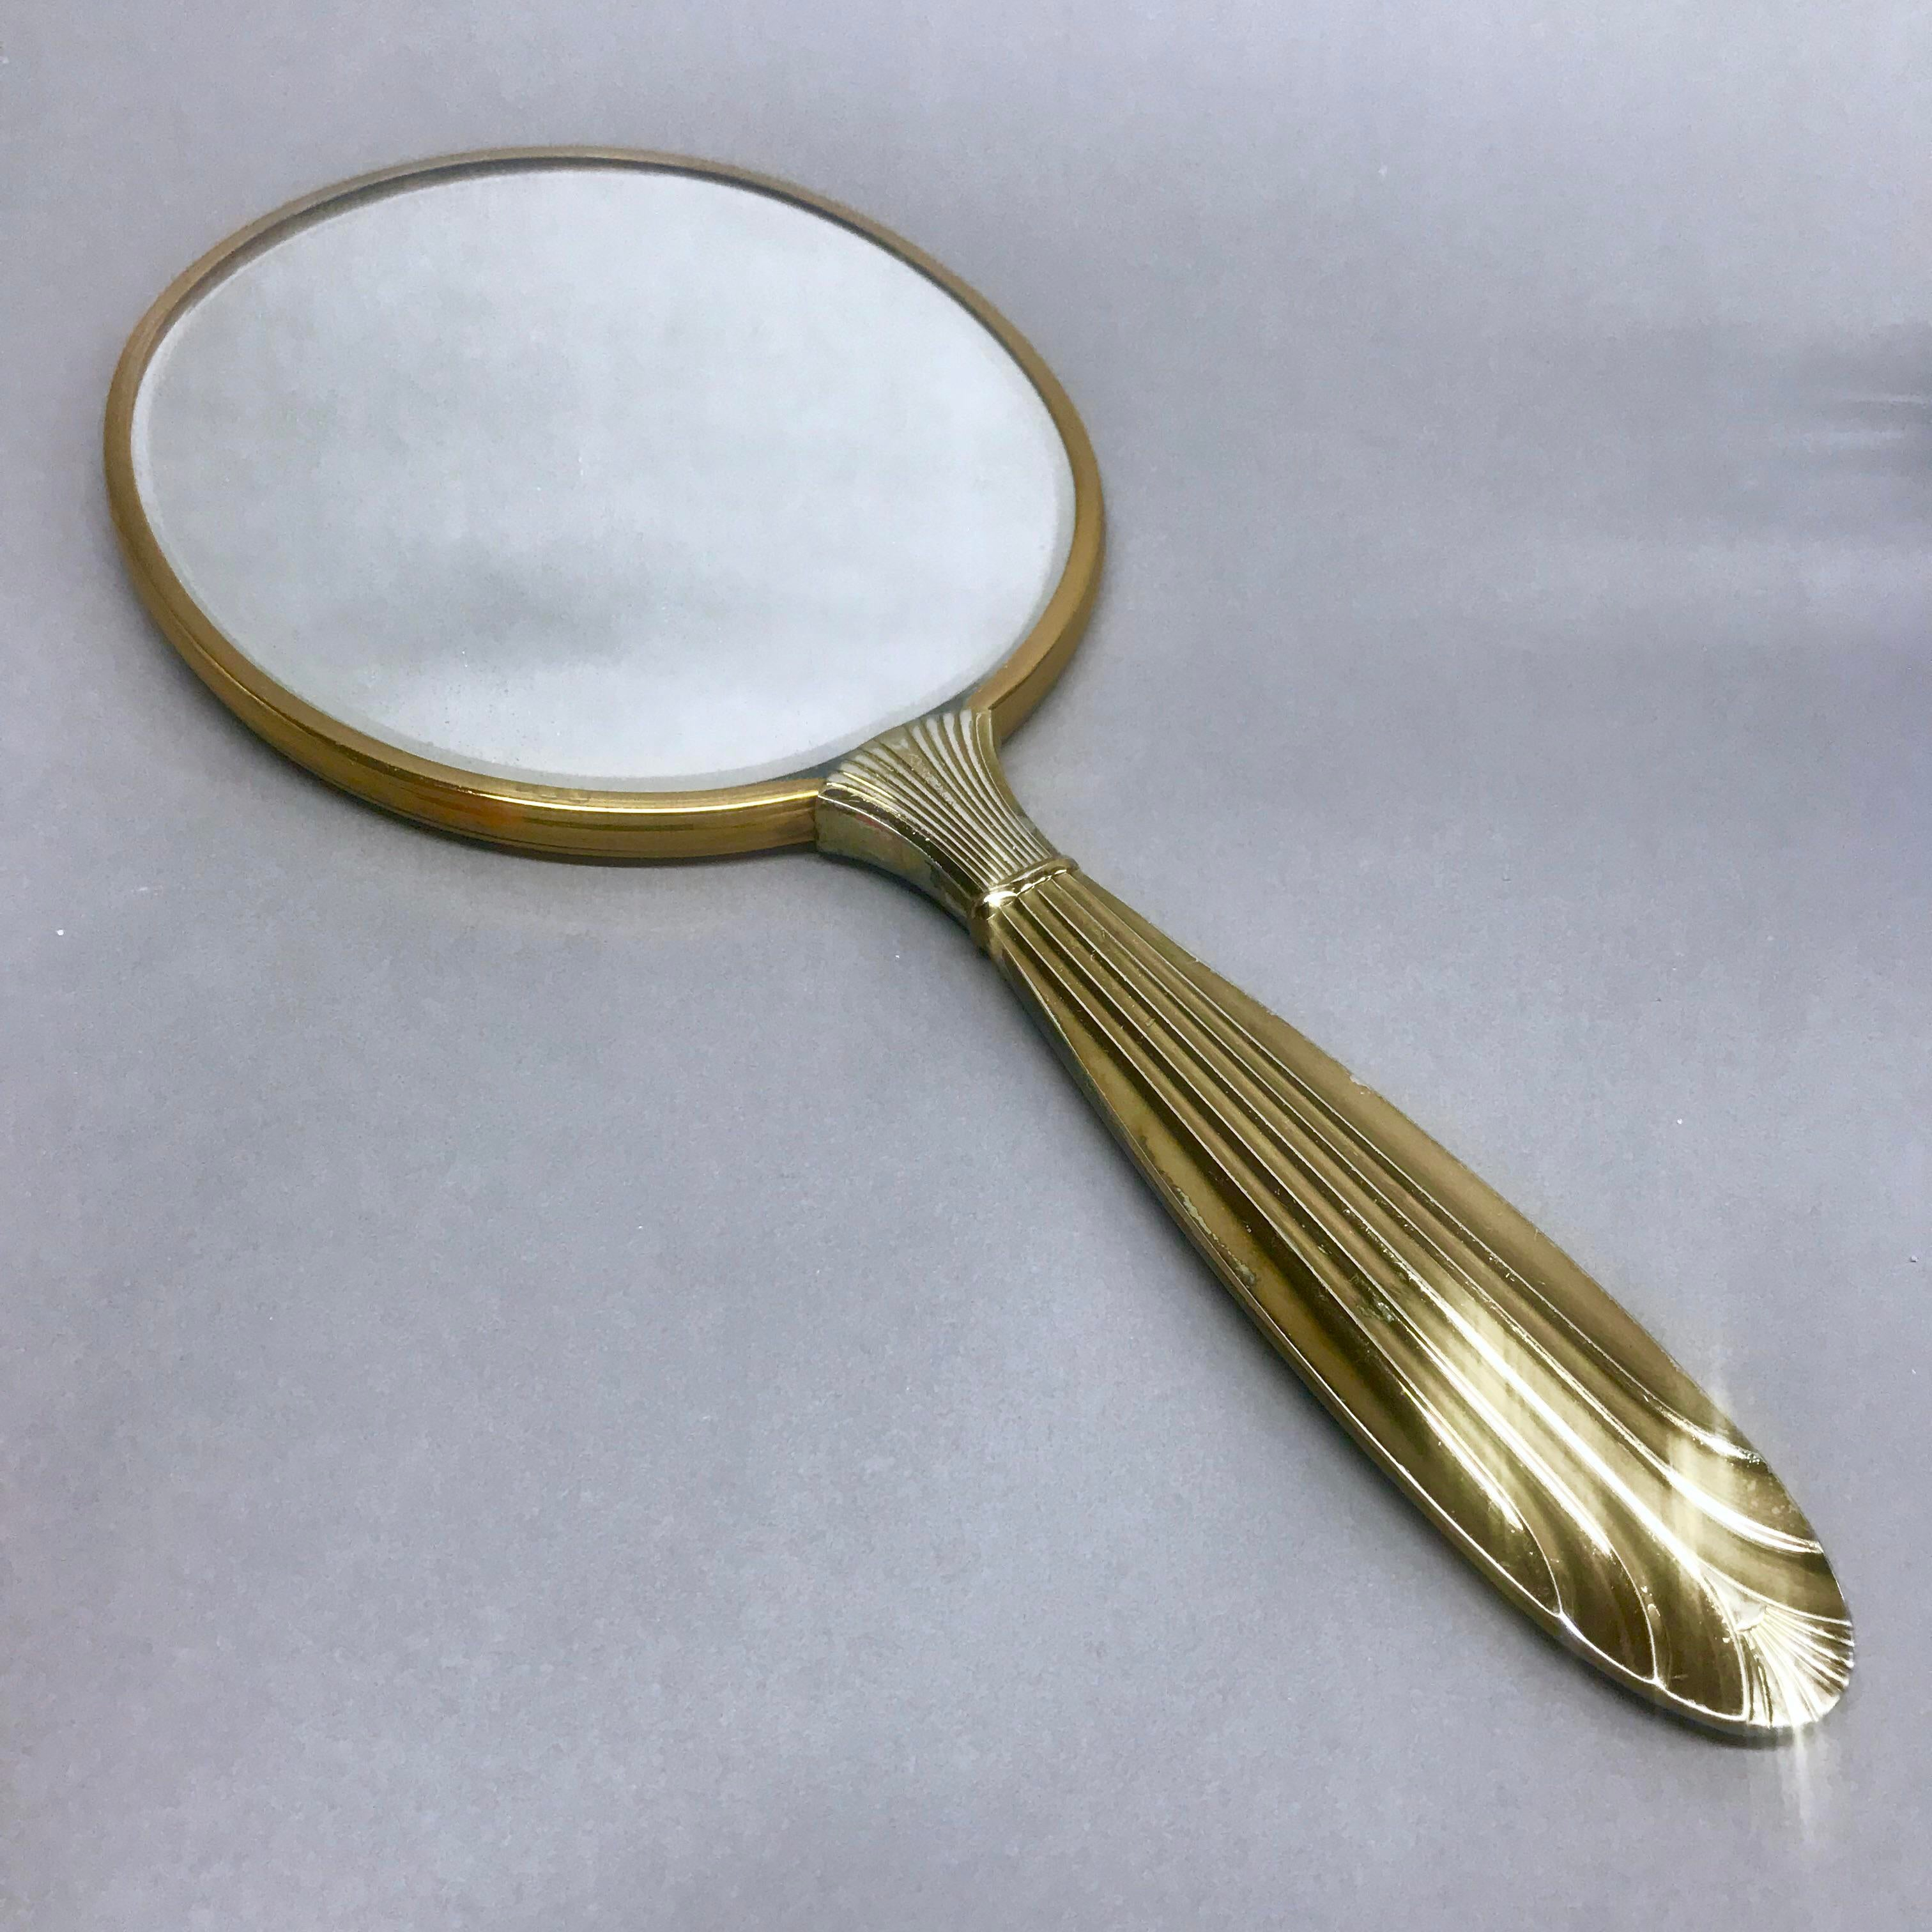 Antique hand mirror Small 1960s 1960s Antique Art Deco Regency Vanity Hand Mirror For Sale Image Of Chairish 1960s Antique Art Deco Regency Vanity Hand Mirror Chairish